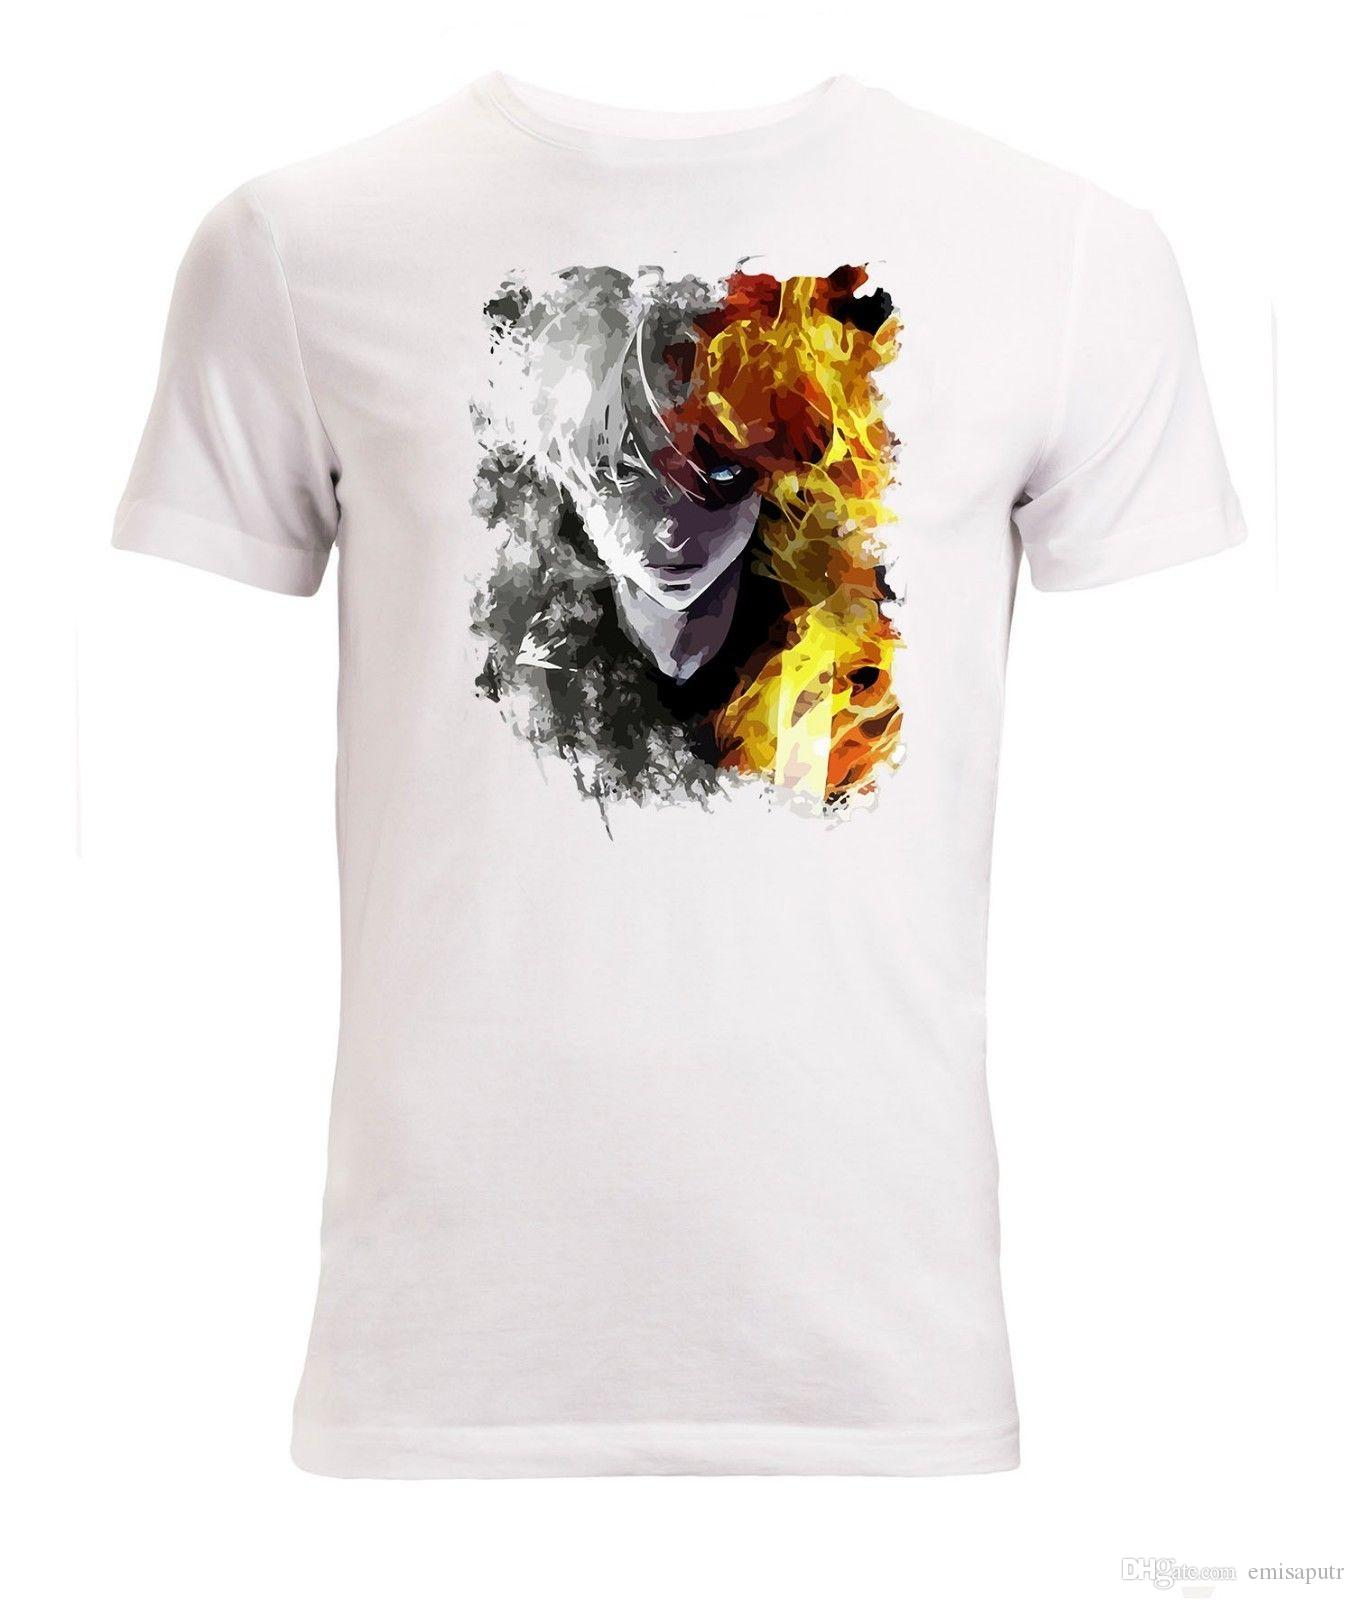 a81b55320ff My Hero Academia Shoto Todoroki Painted Art Men S White T Shirt Sizes S XXL  Vintage T Shirts Band T Shirts From Emisaputr